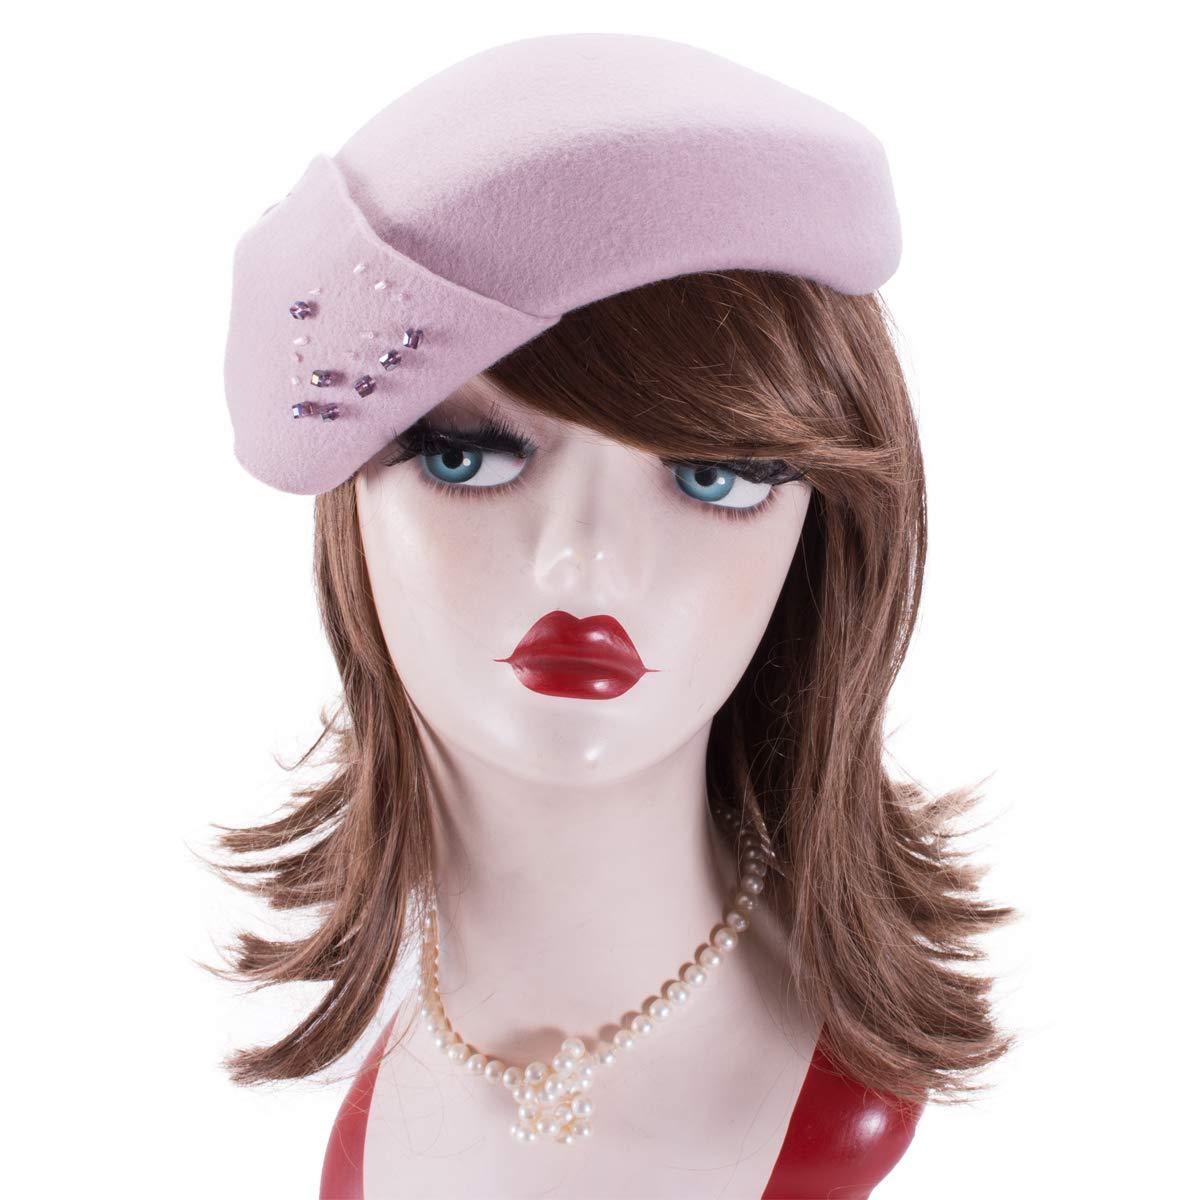 Lawliet Womens 1940s Wool Felt Tam Casque Beret Fascinator Hat A556